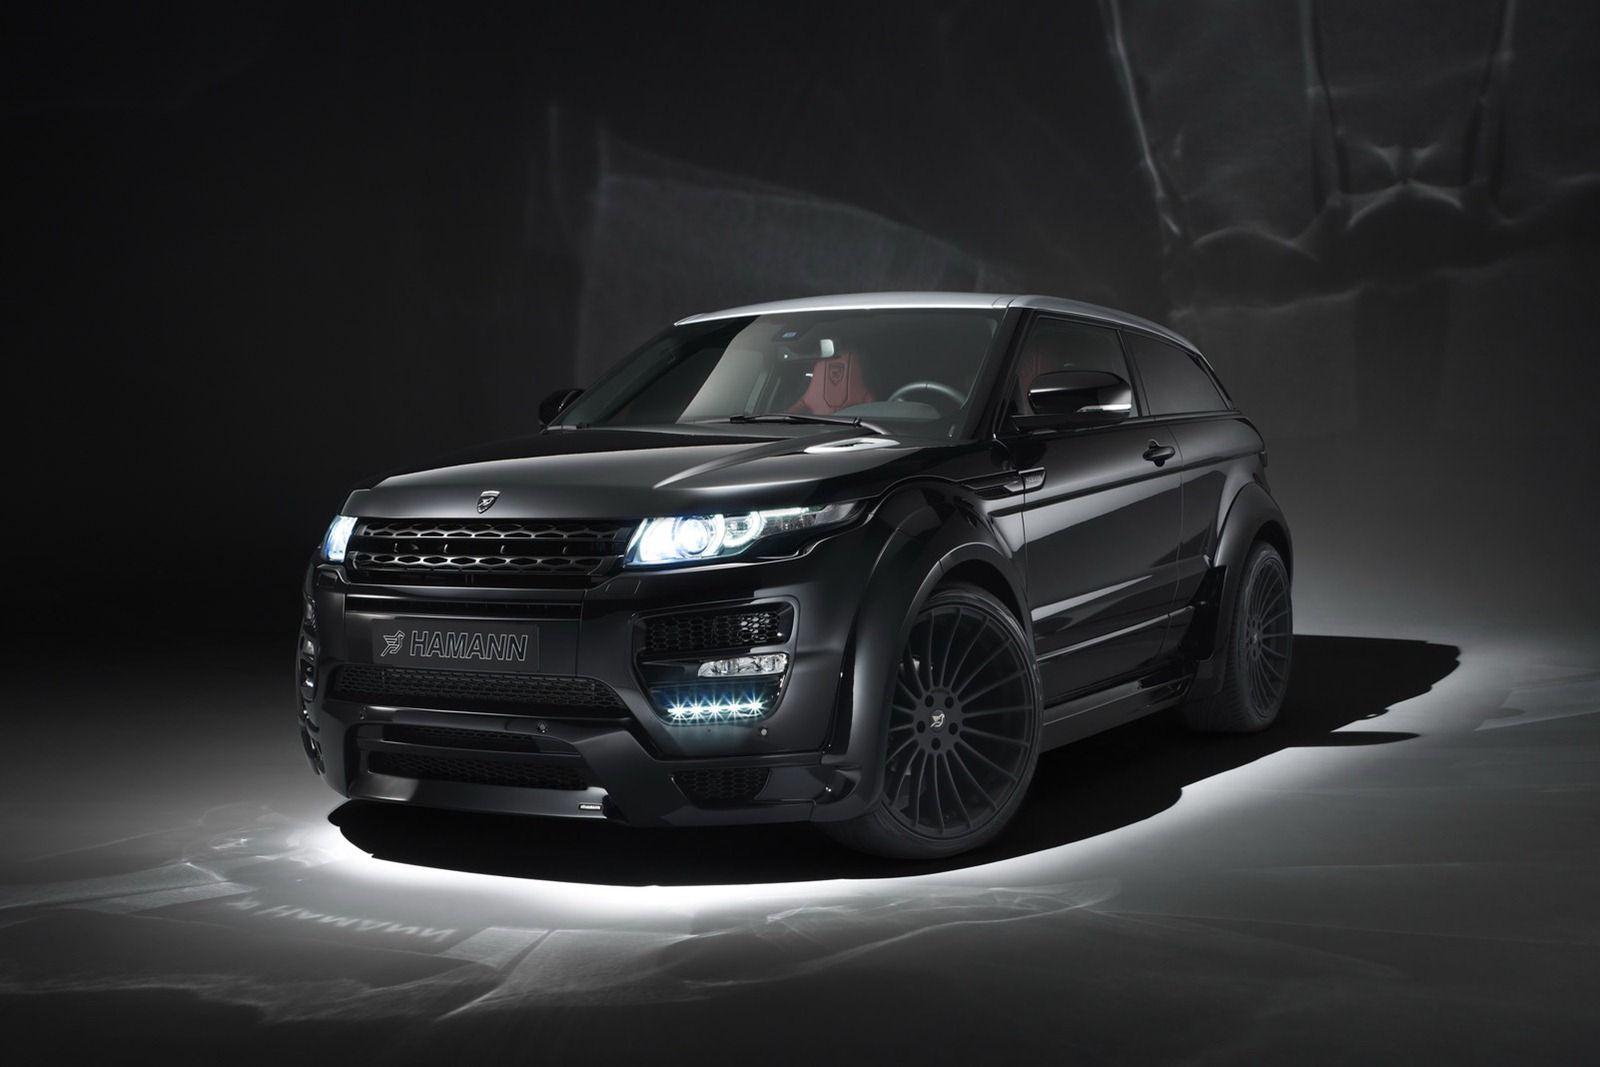 Hamman Range Rover Evo